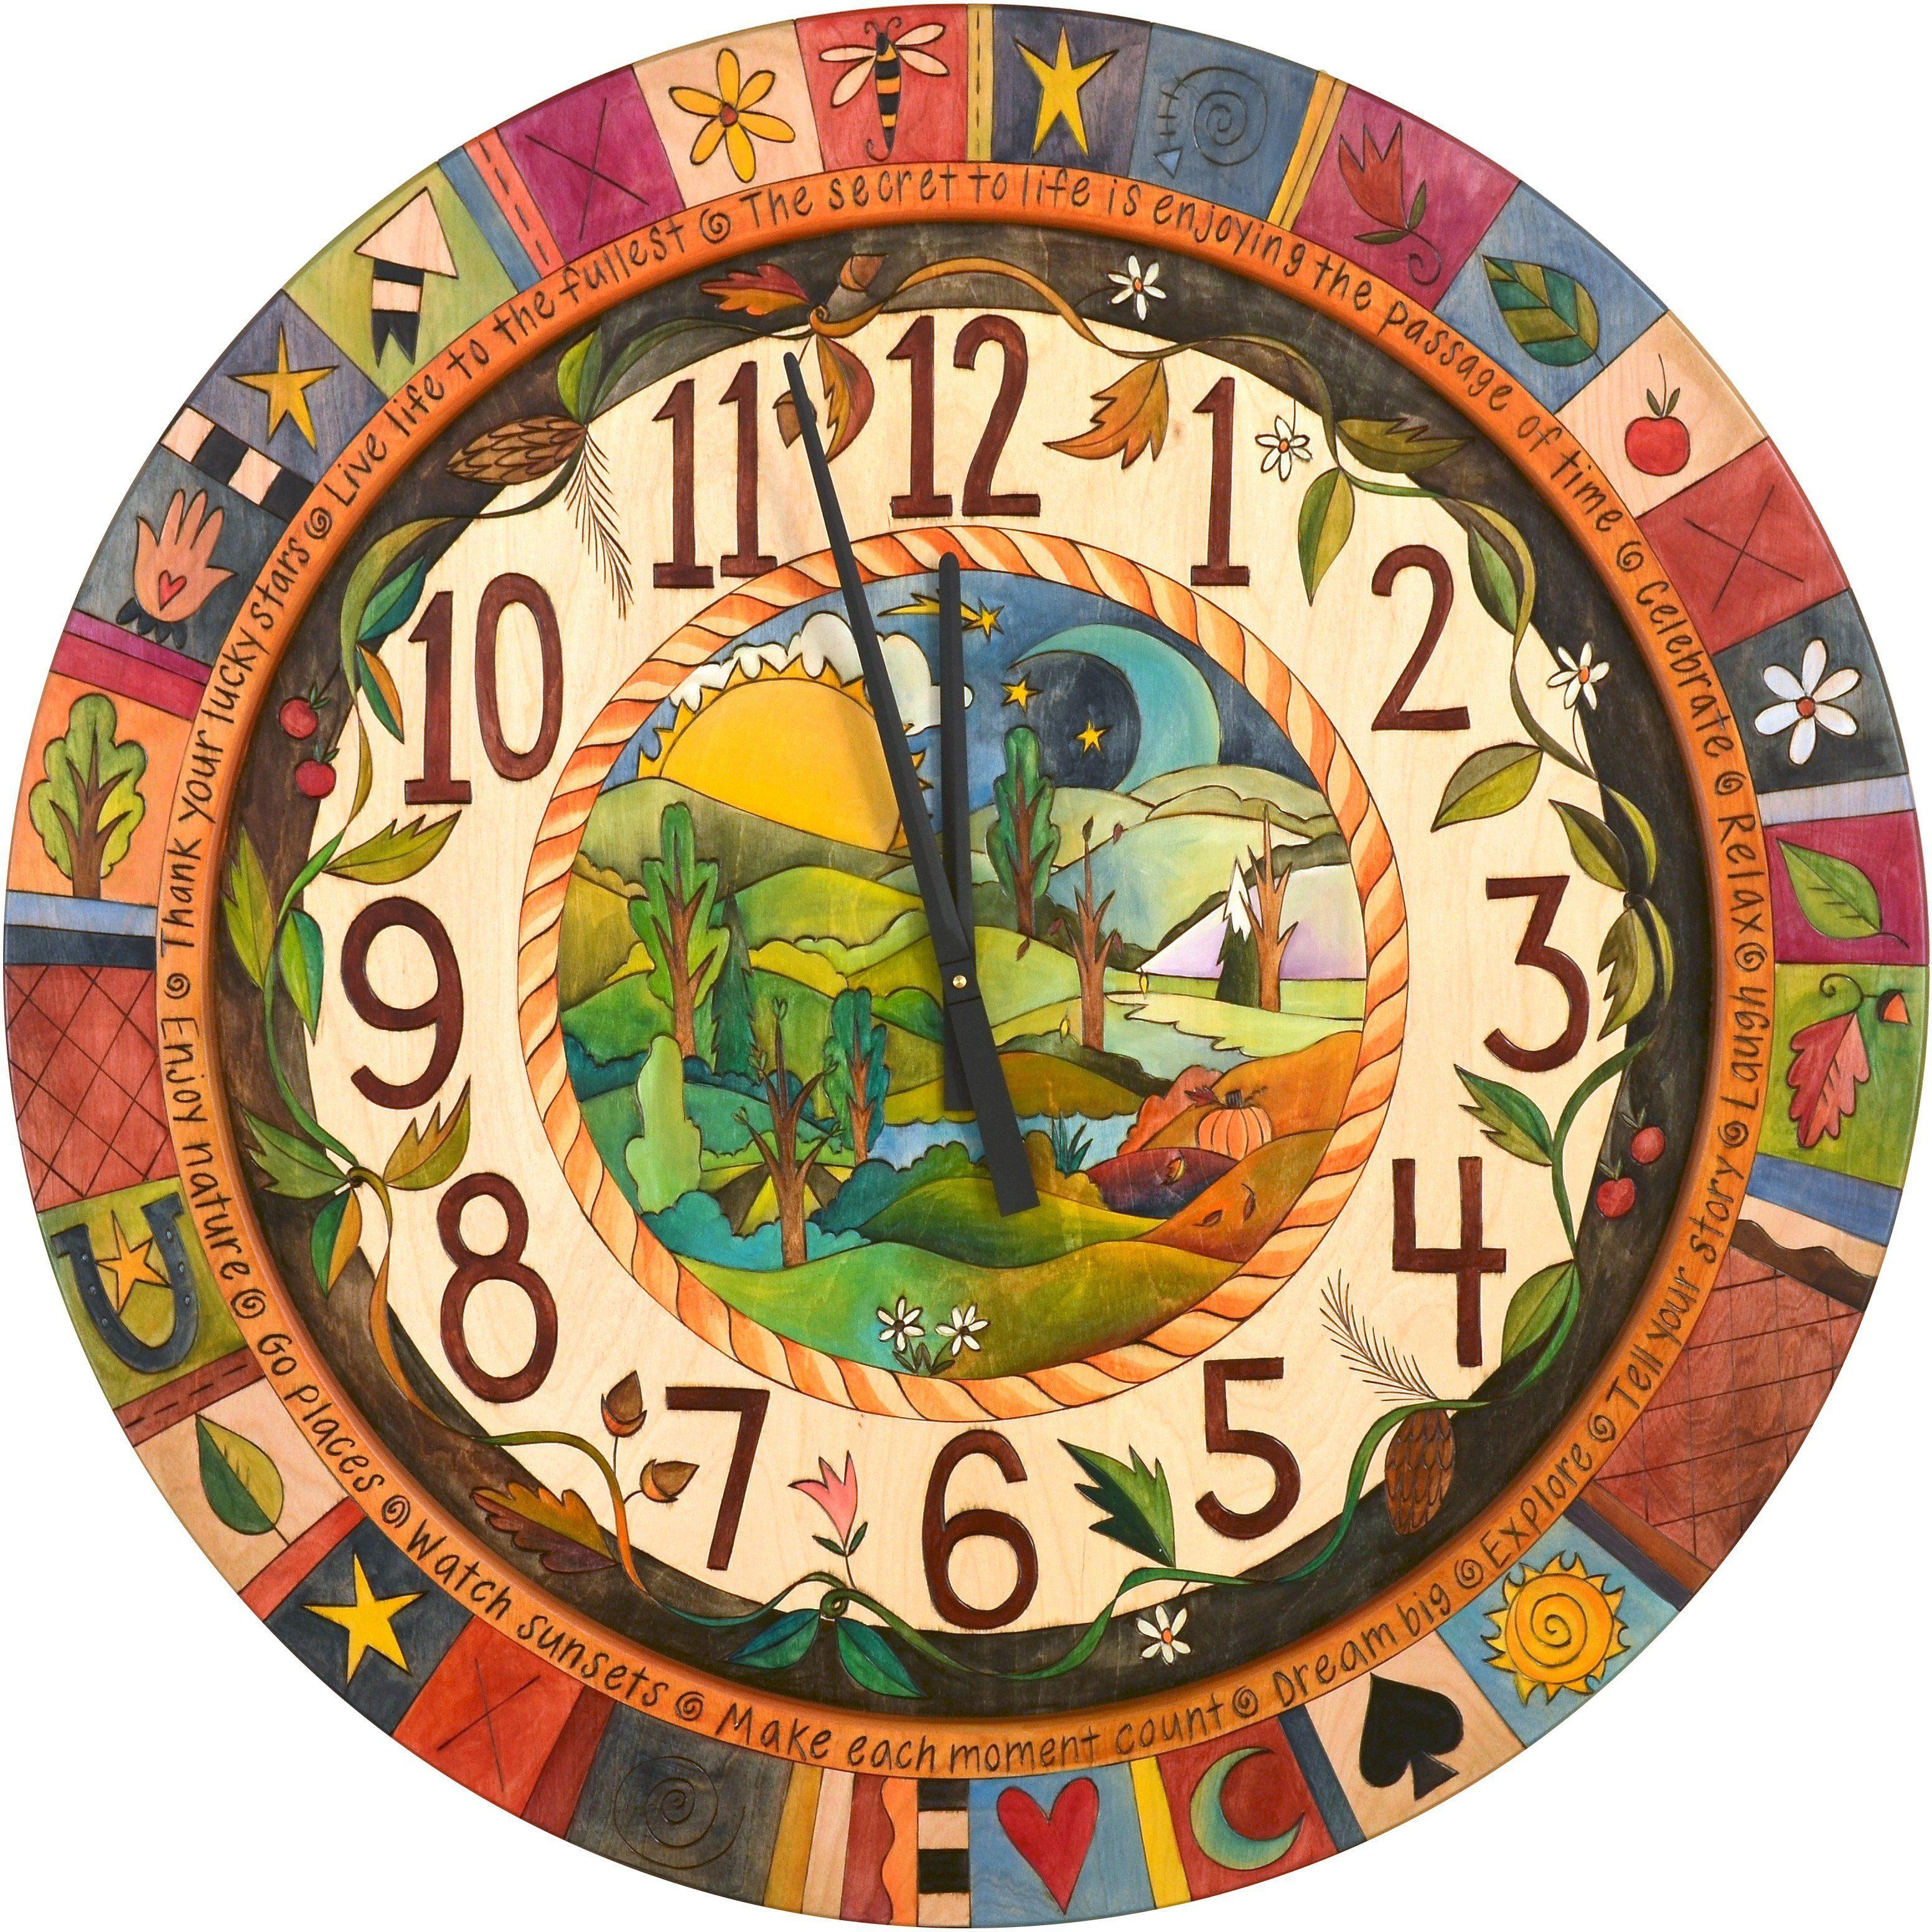 36 round wall clock clock painting clock art clock on wall clocks id=71013